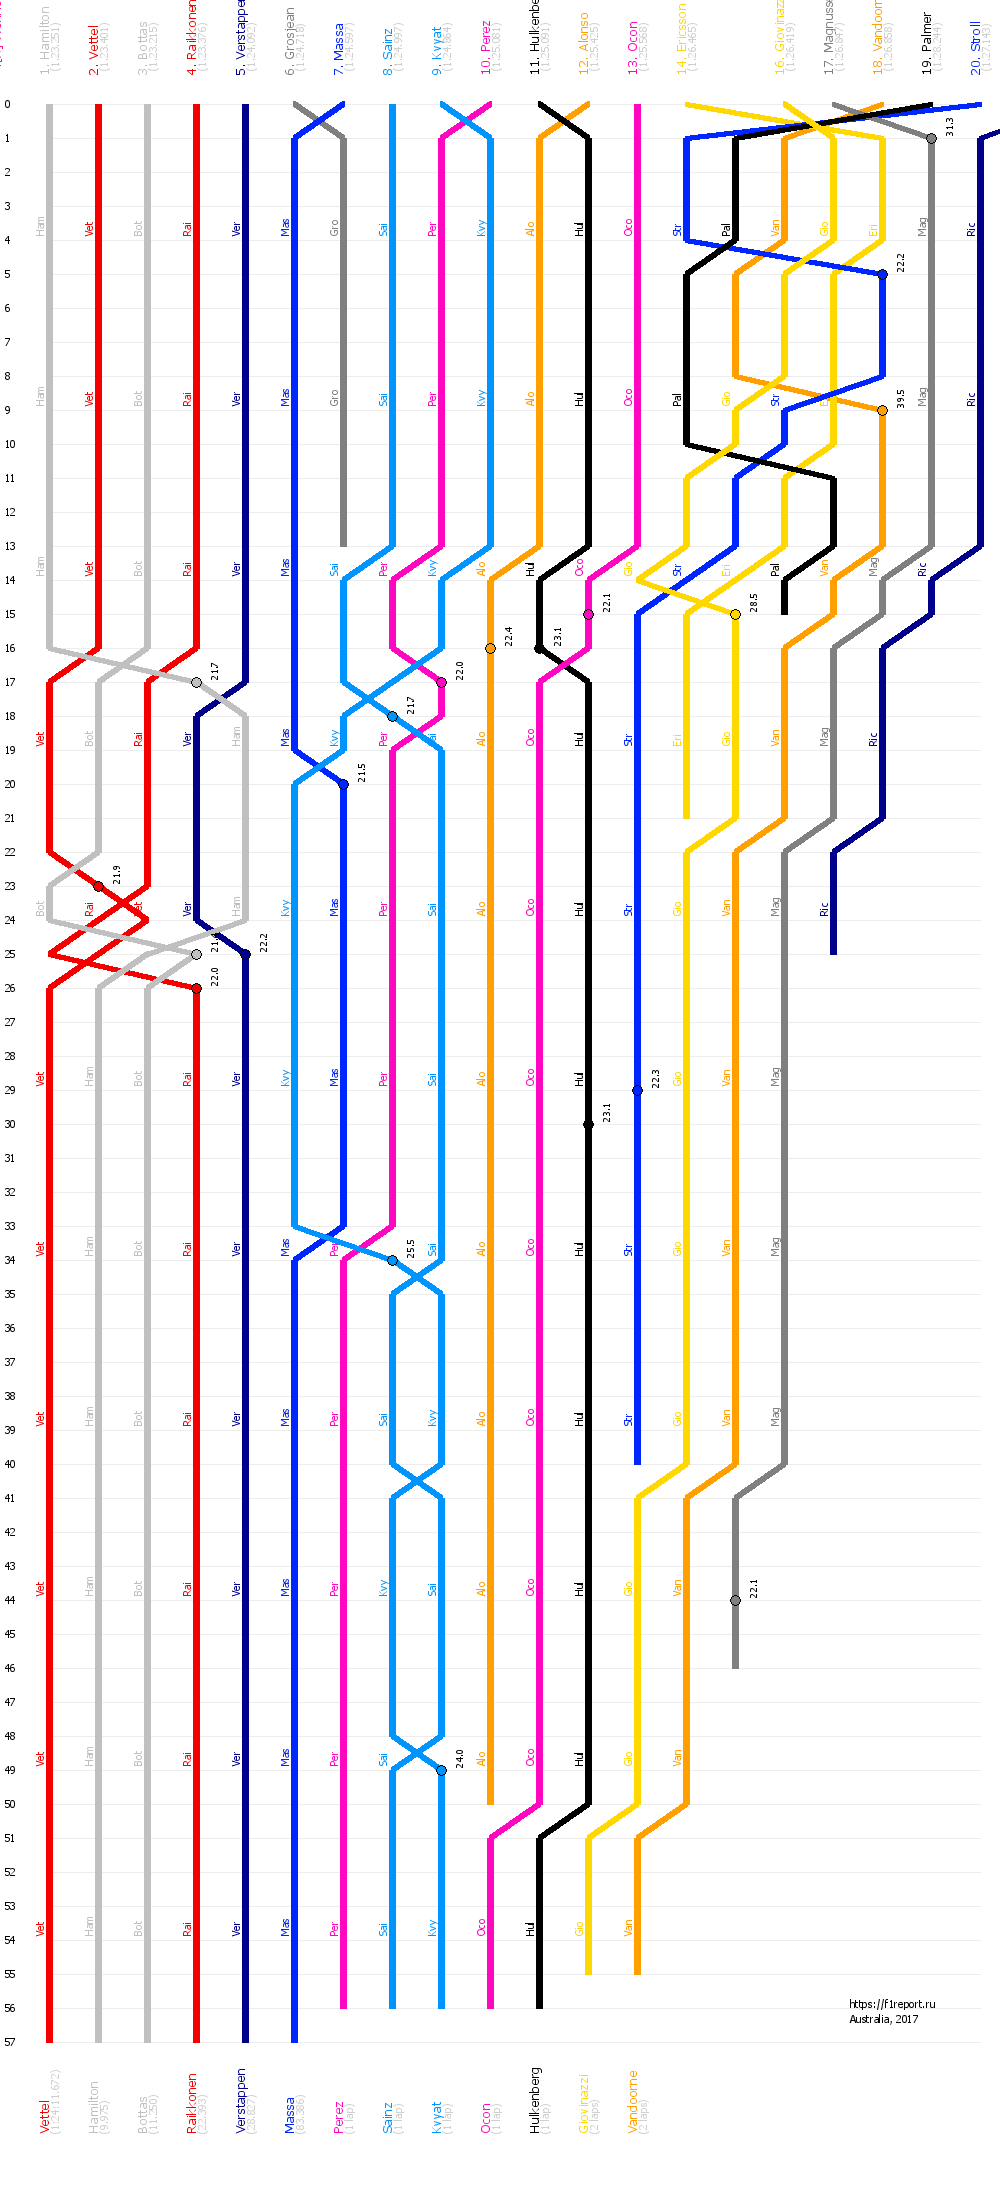 Гран при Австралии 2017 | График F1